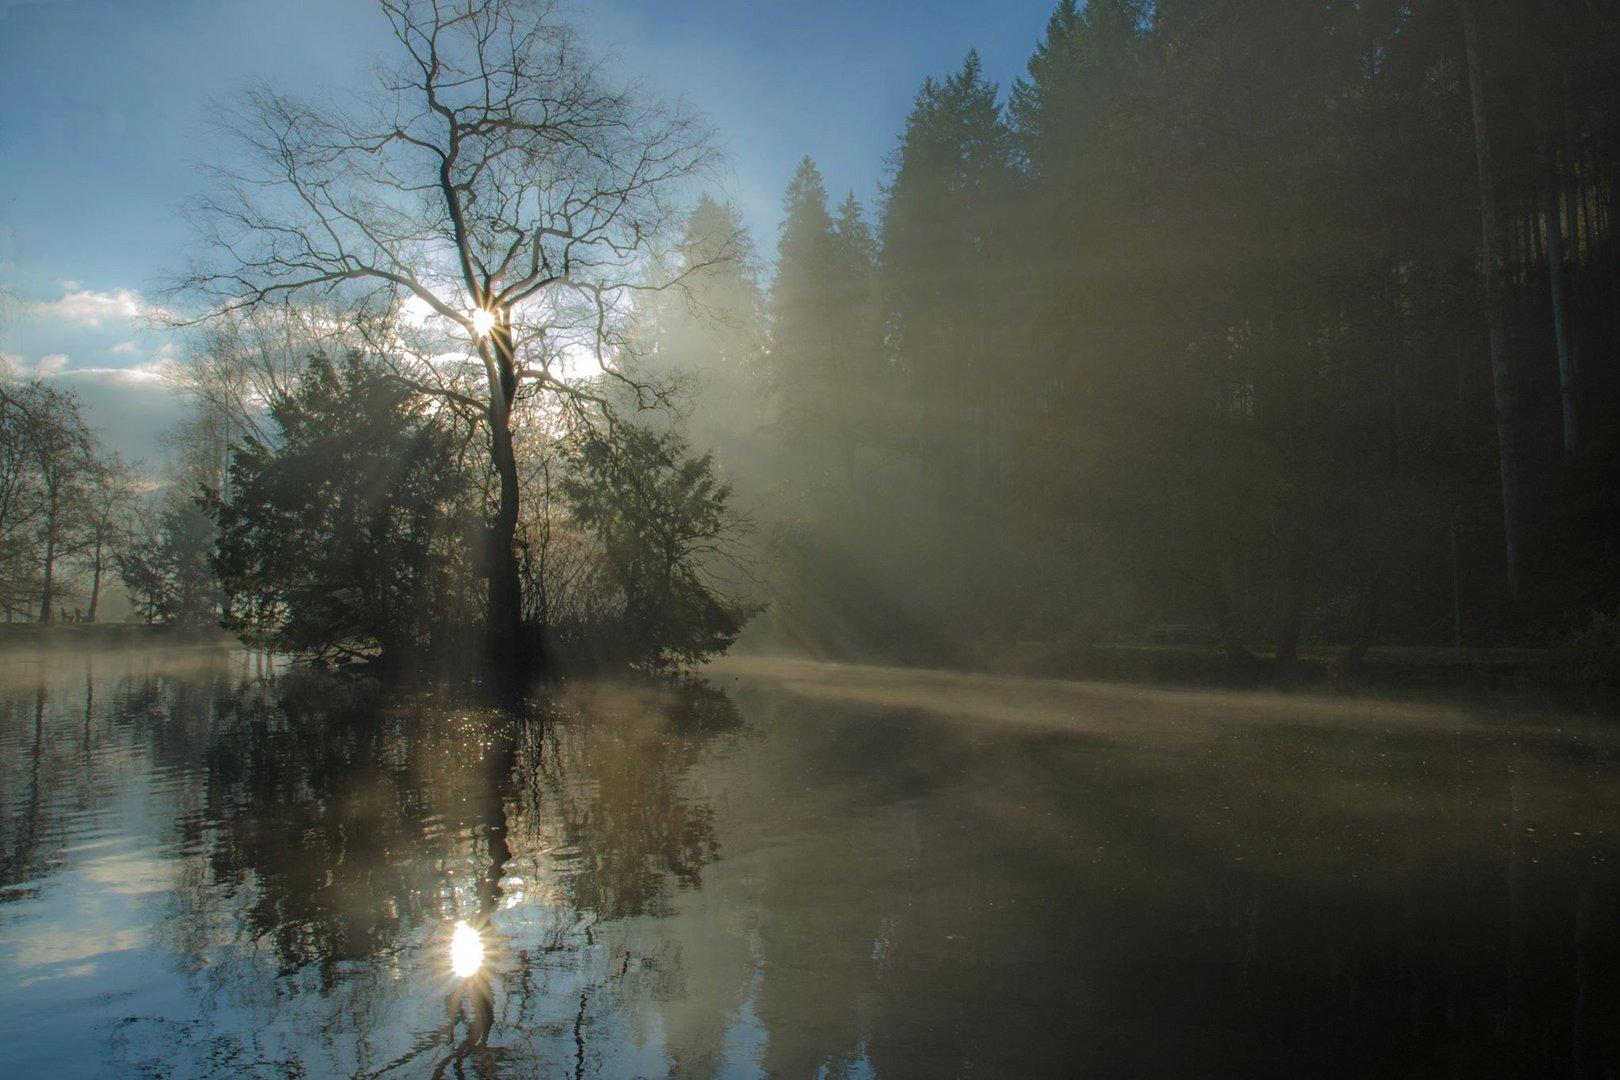 Nebliger Sonnenaufgang am Waldsee